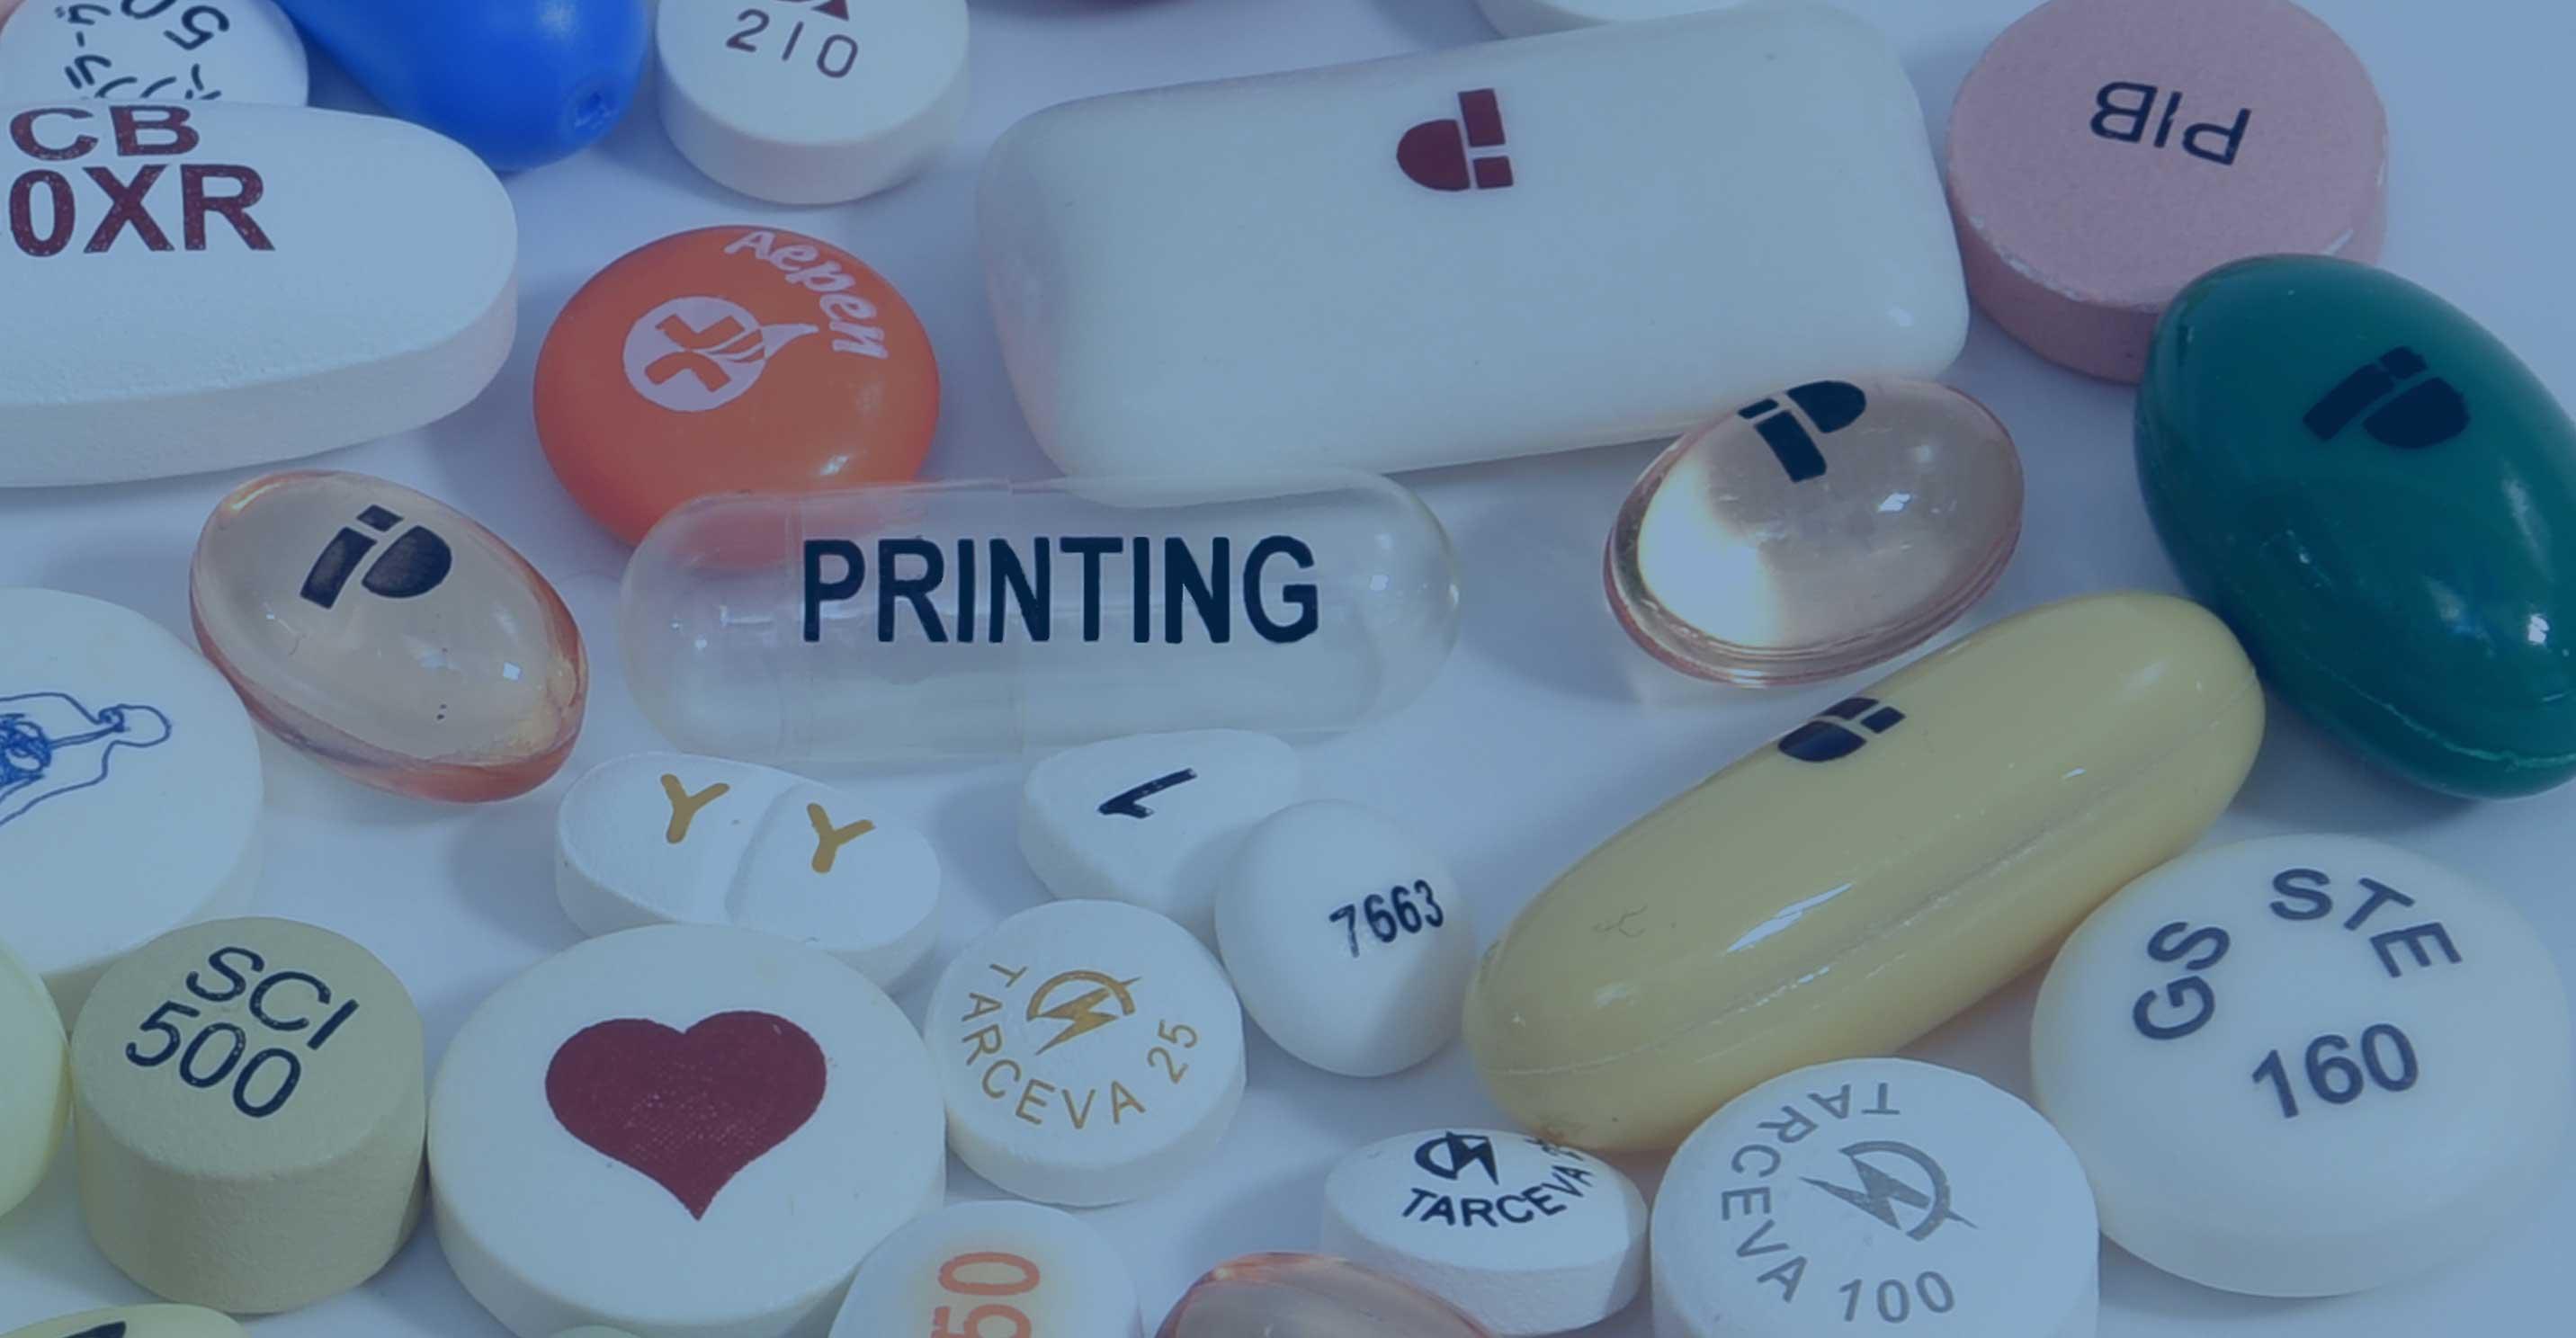 Pharmaceutical pad printing